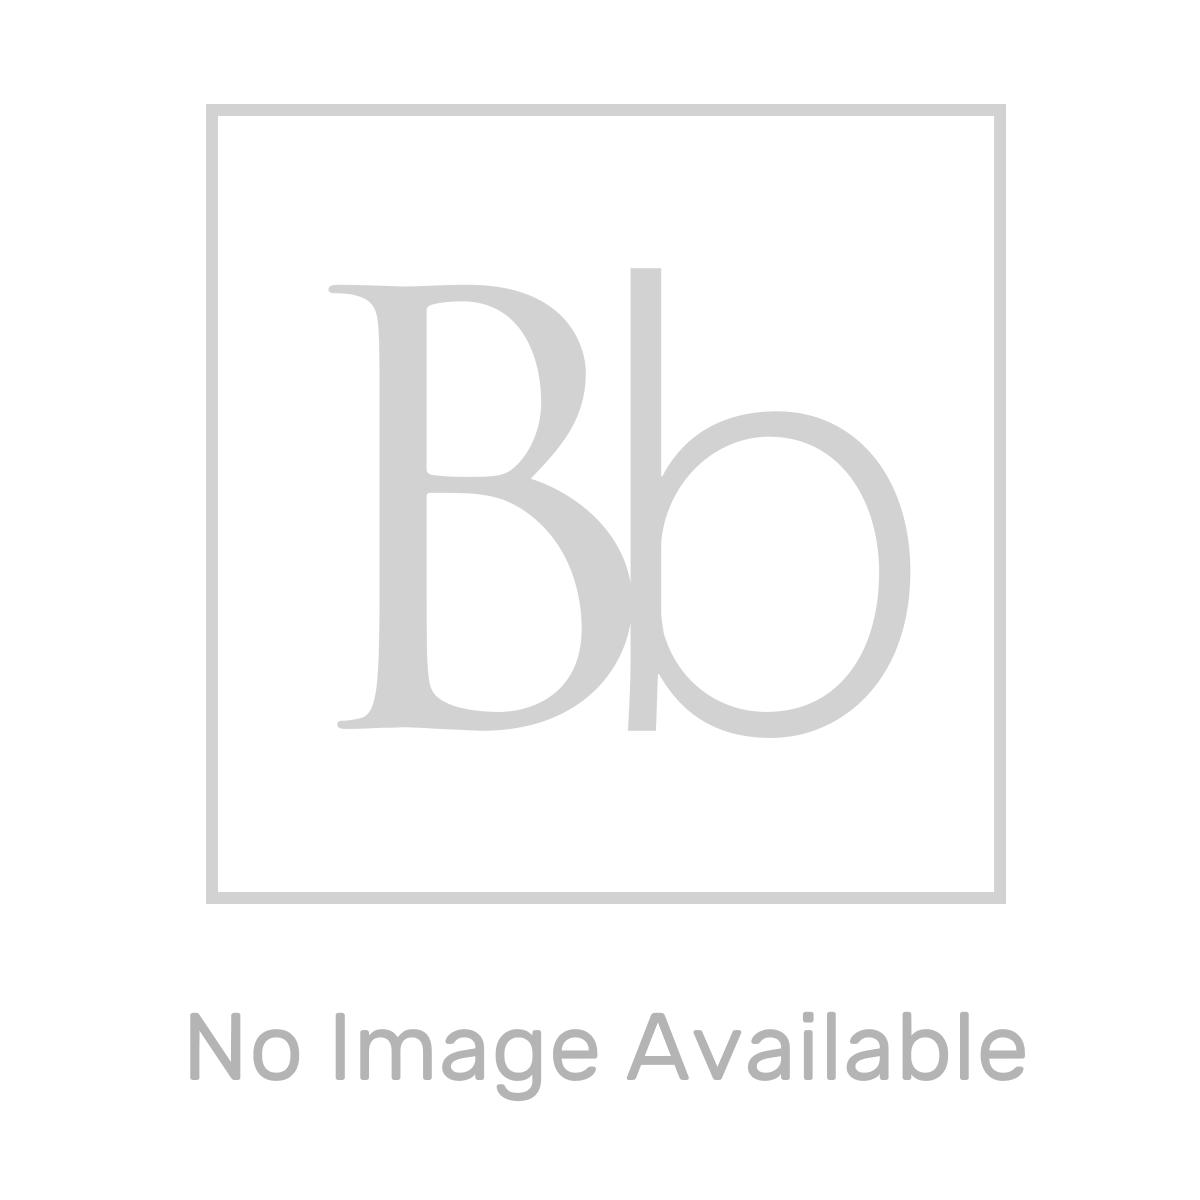 HiB Globe 45 LED Steam Free Bathroom Mirror